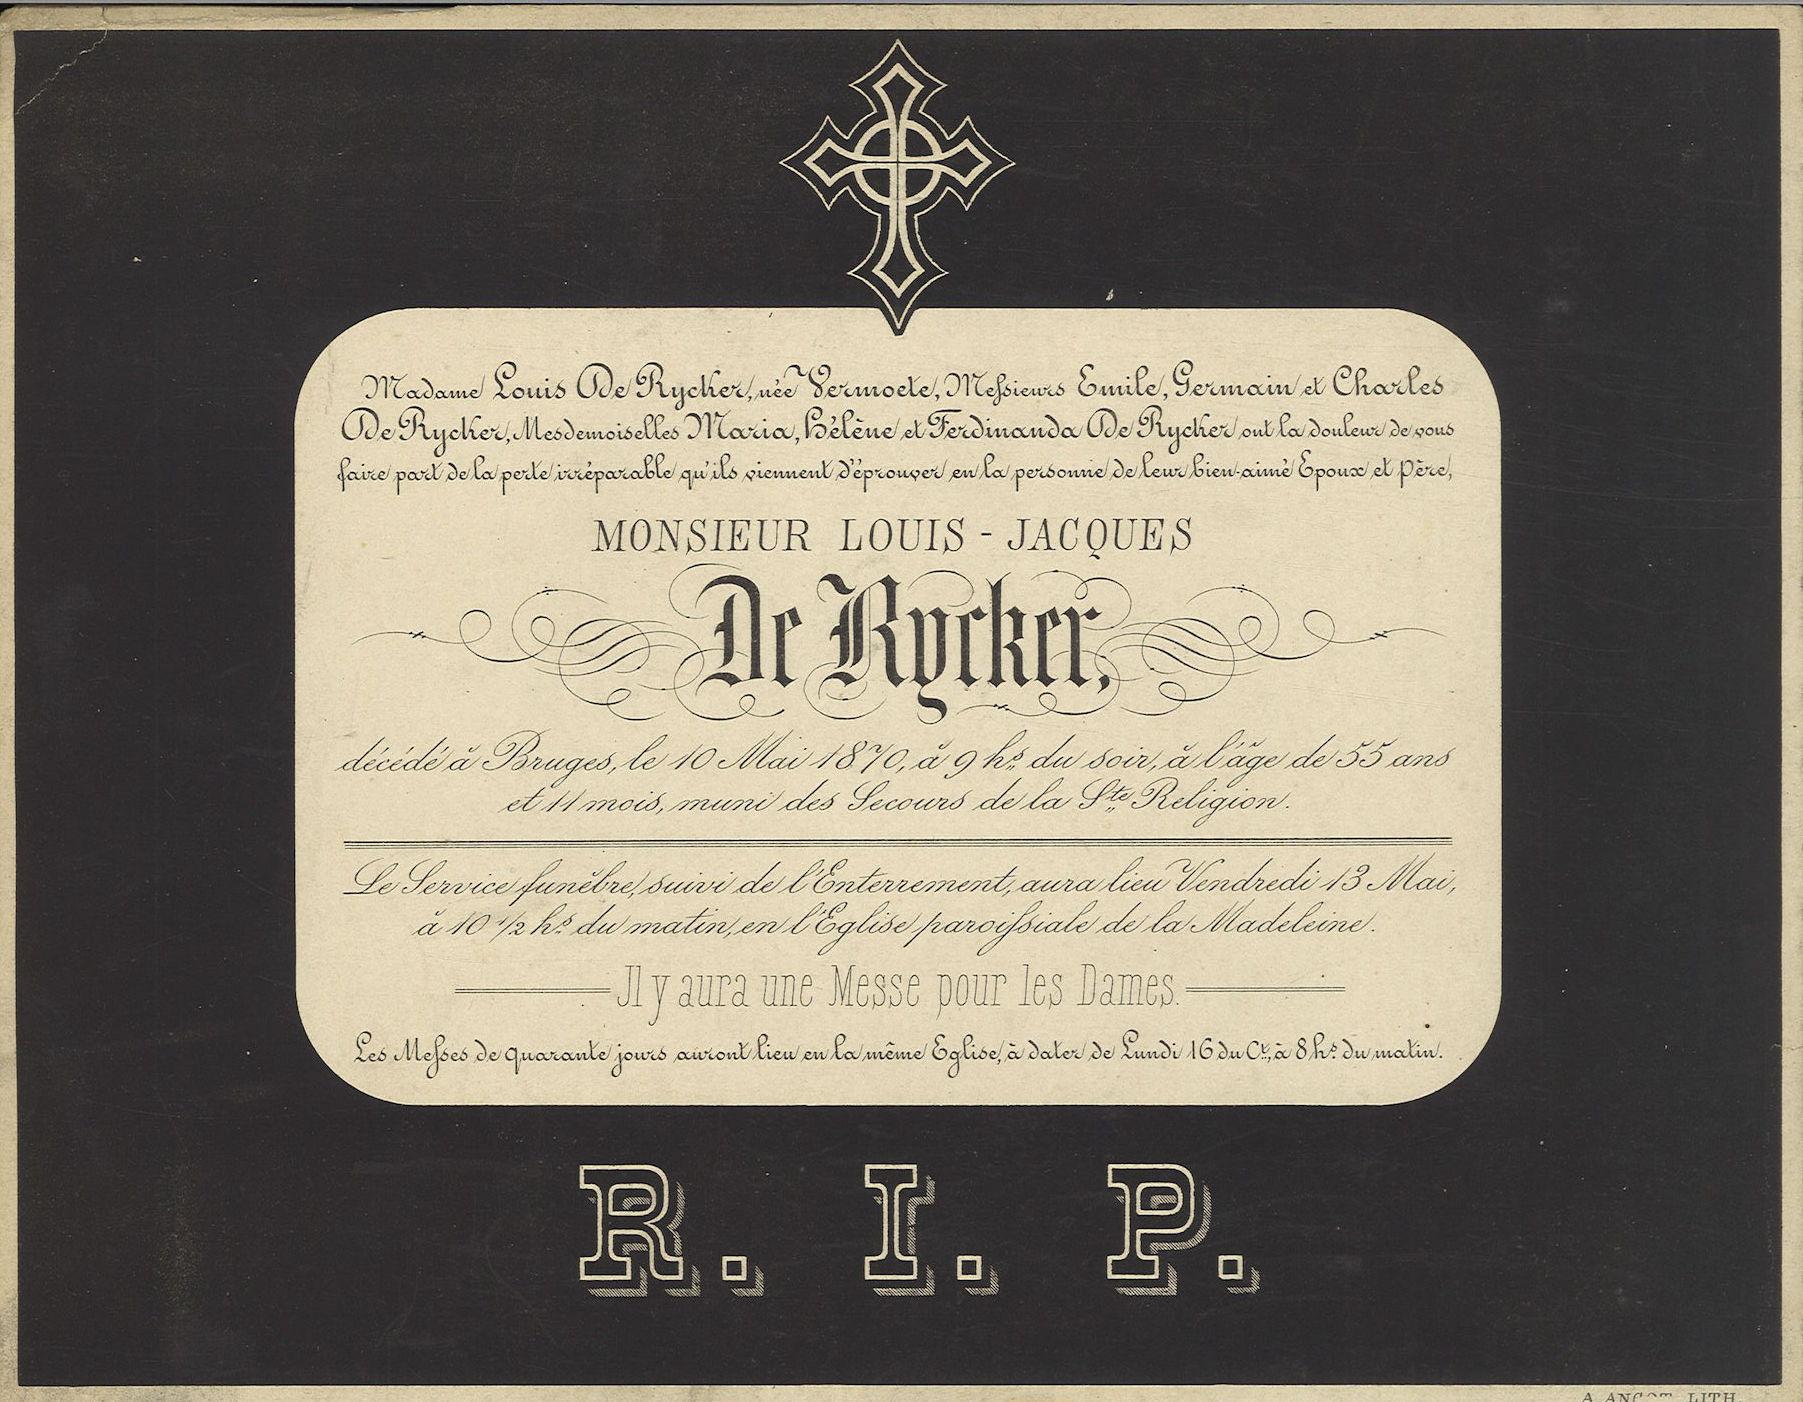 Louis-Jacques De Rycker